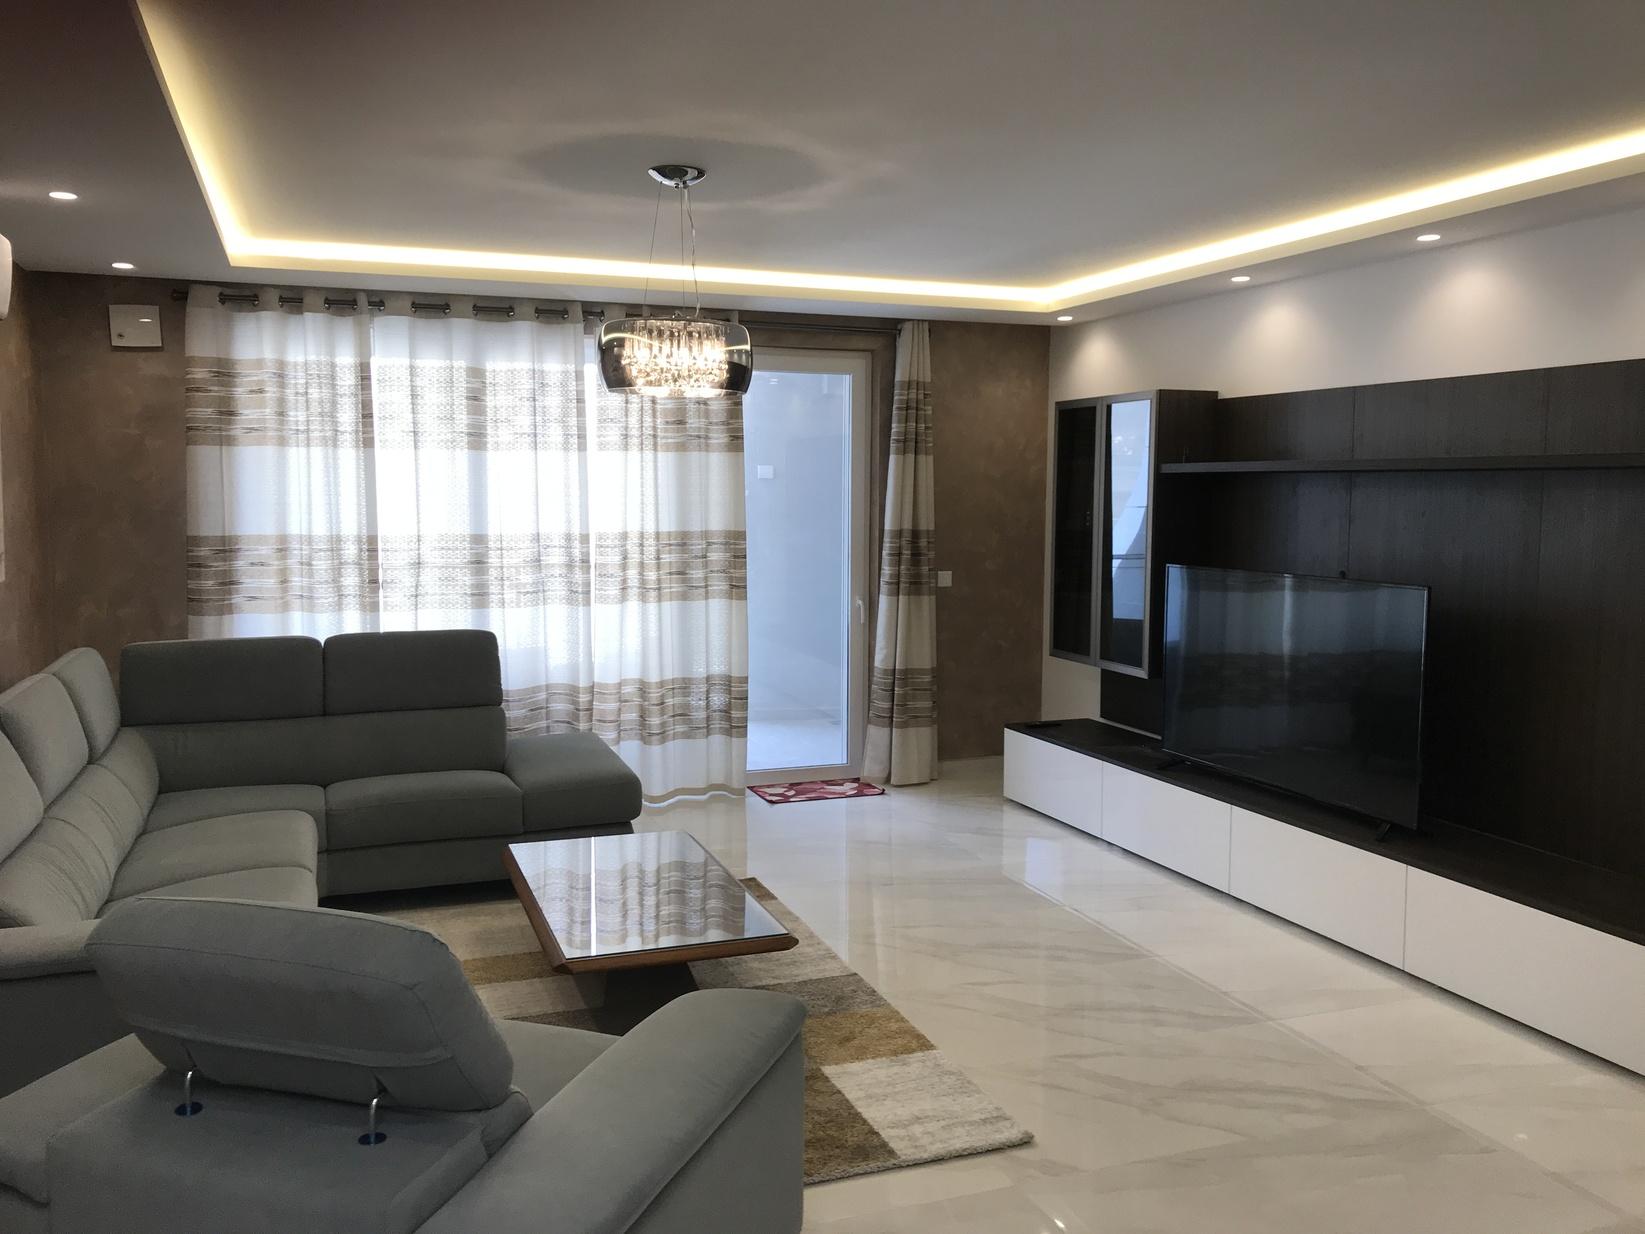 3 bed Apartment For Rent in Qawra, Qawra - thumb 11